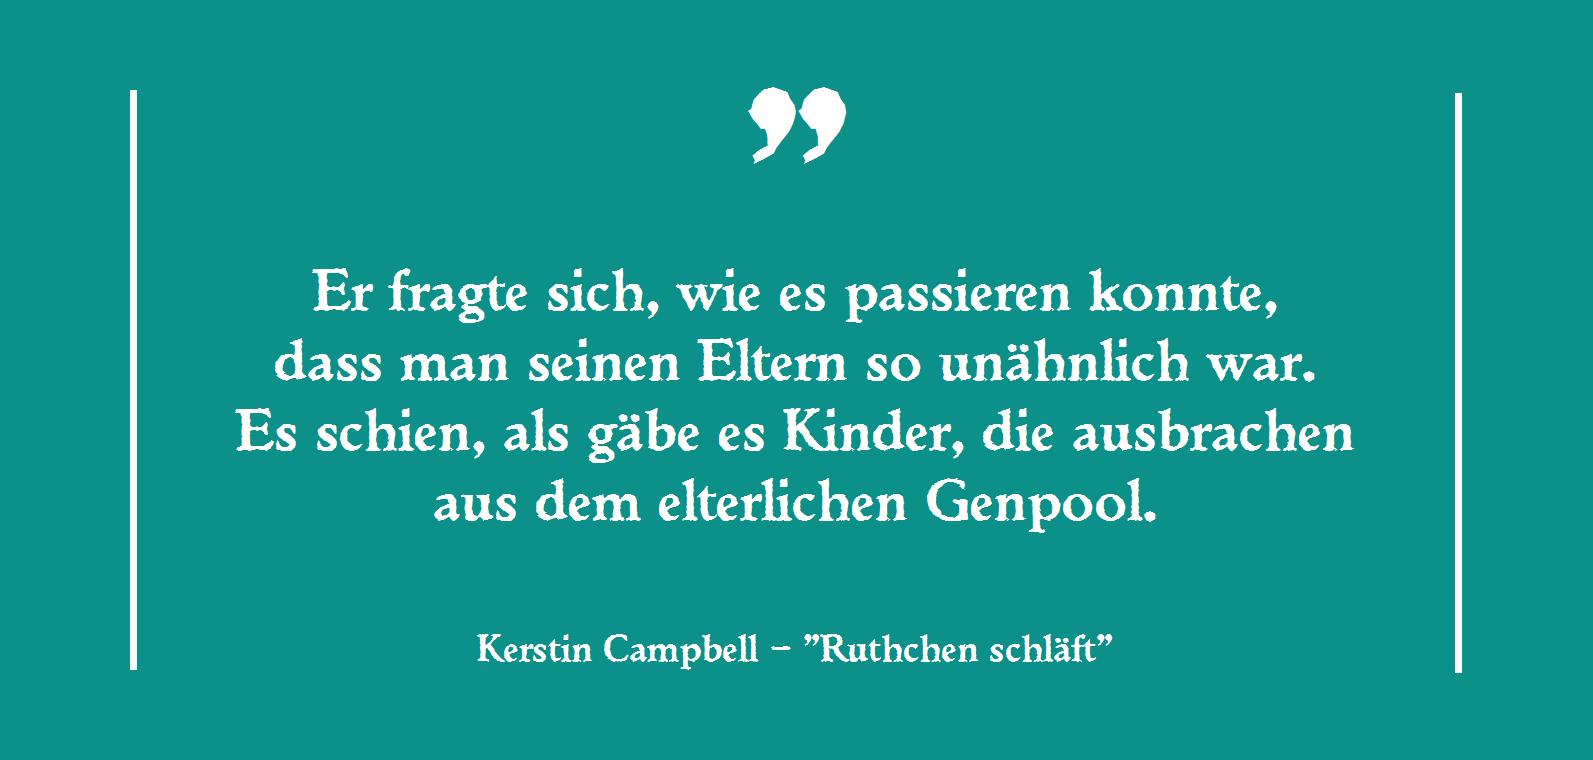 Kerstin Campebell - Ruthchen schläft